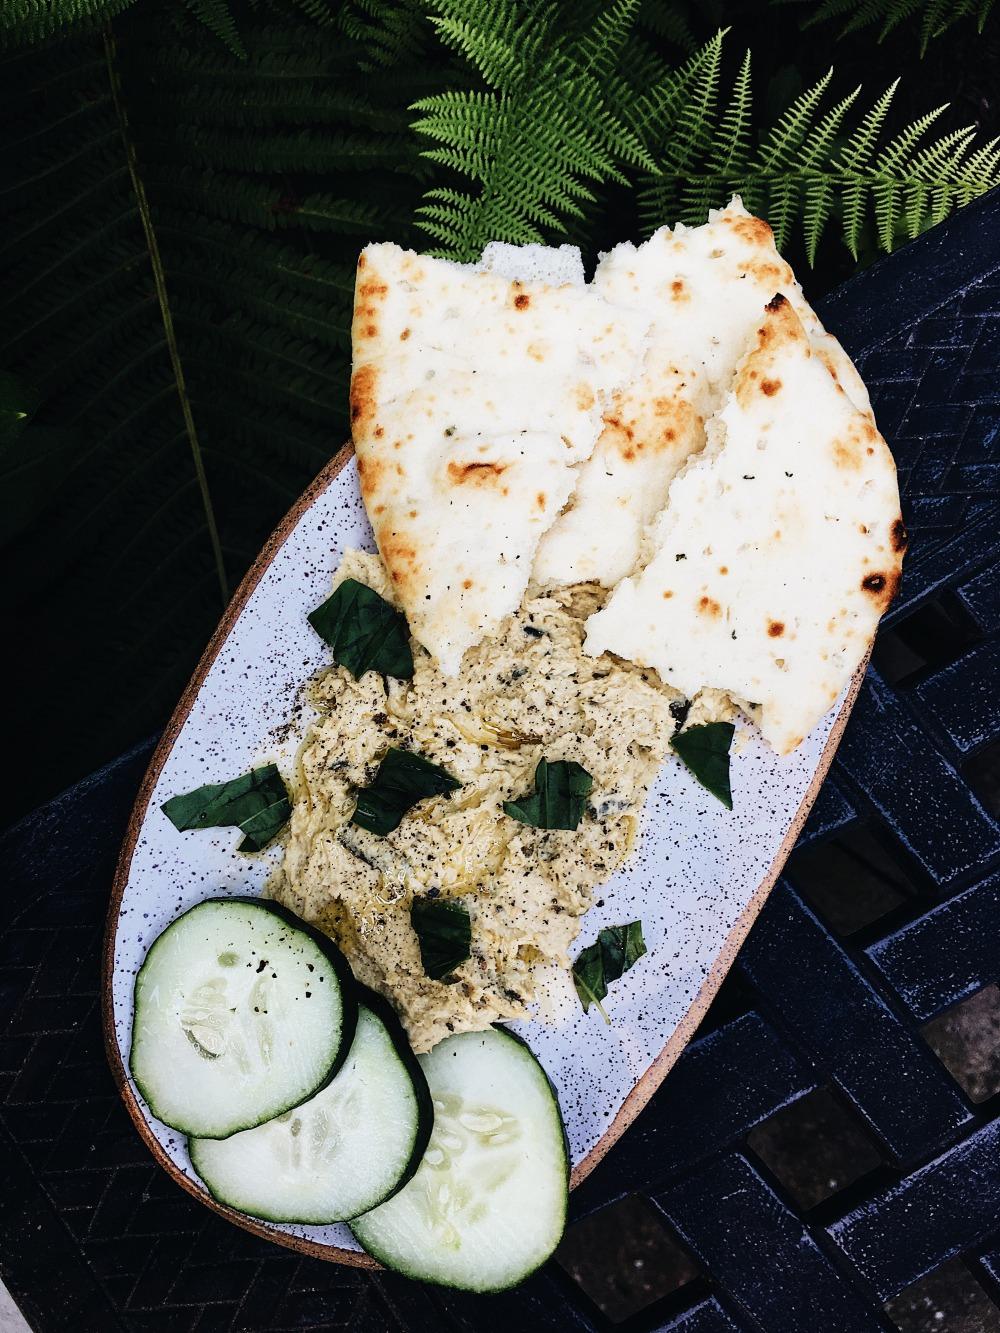 Garlic Scape Hummus Close Overhead View